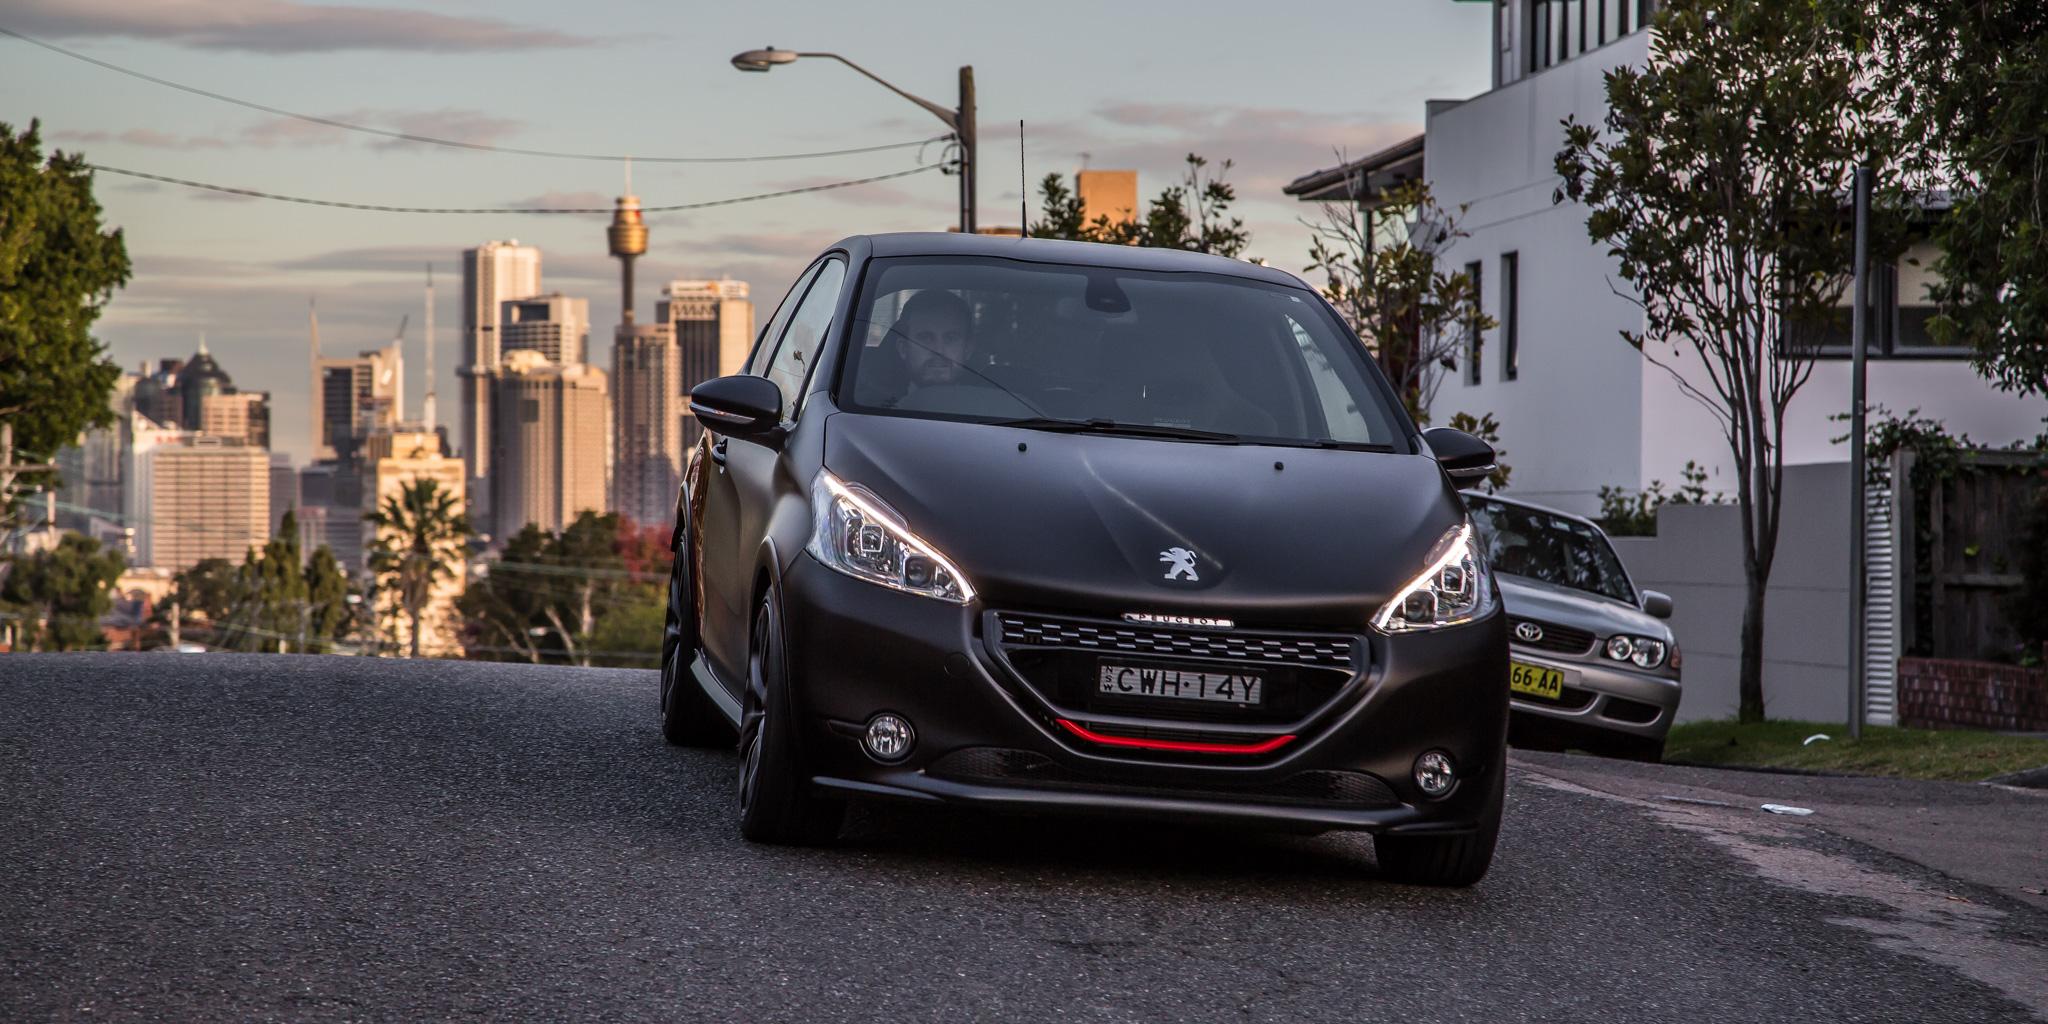 Новый Peugeot (Пежо) 208 GTi будет электромобилем